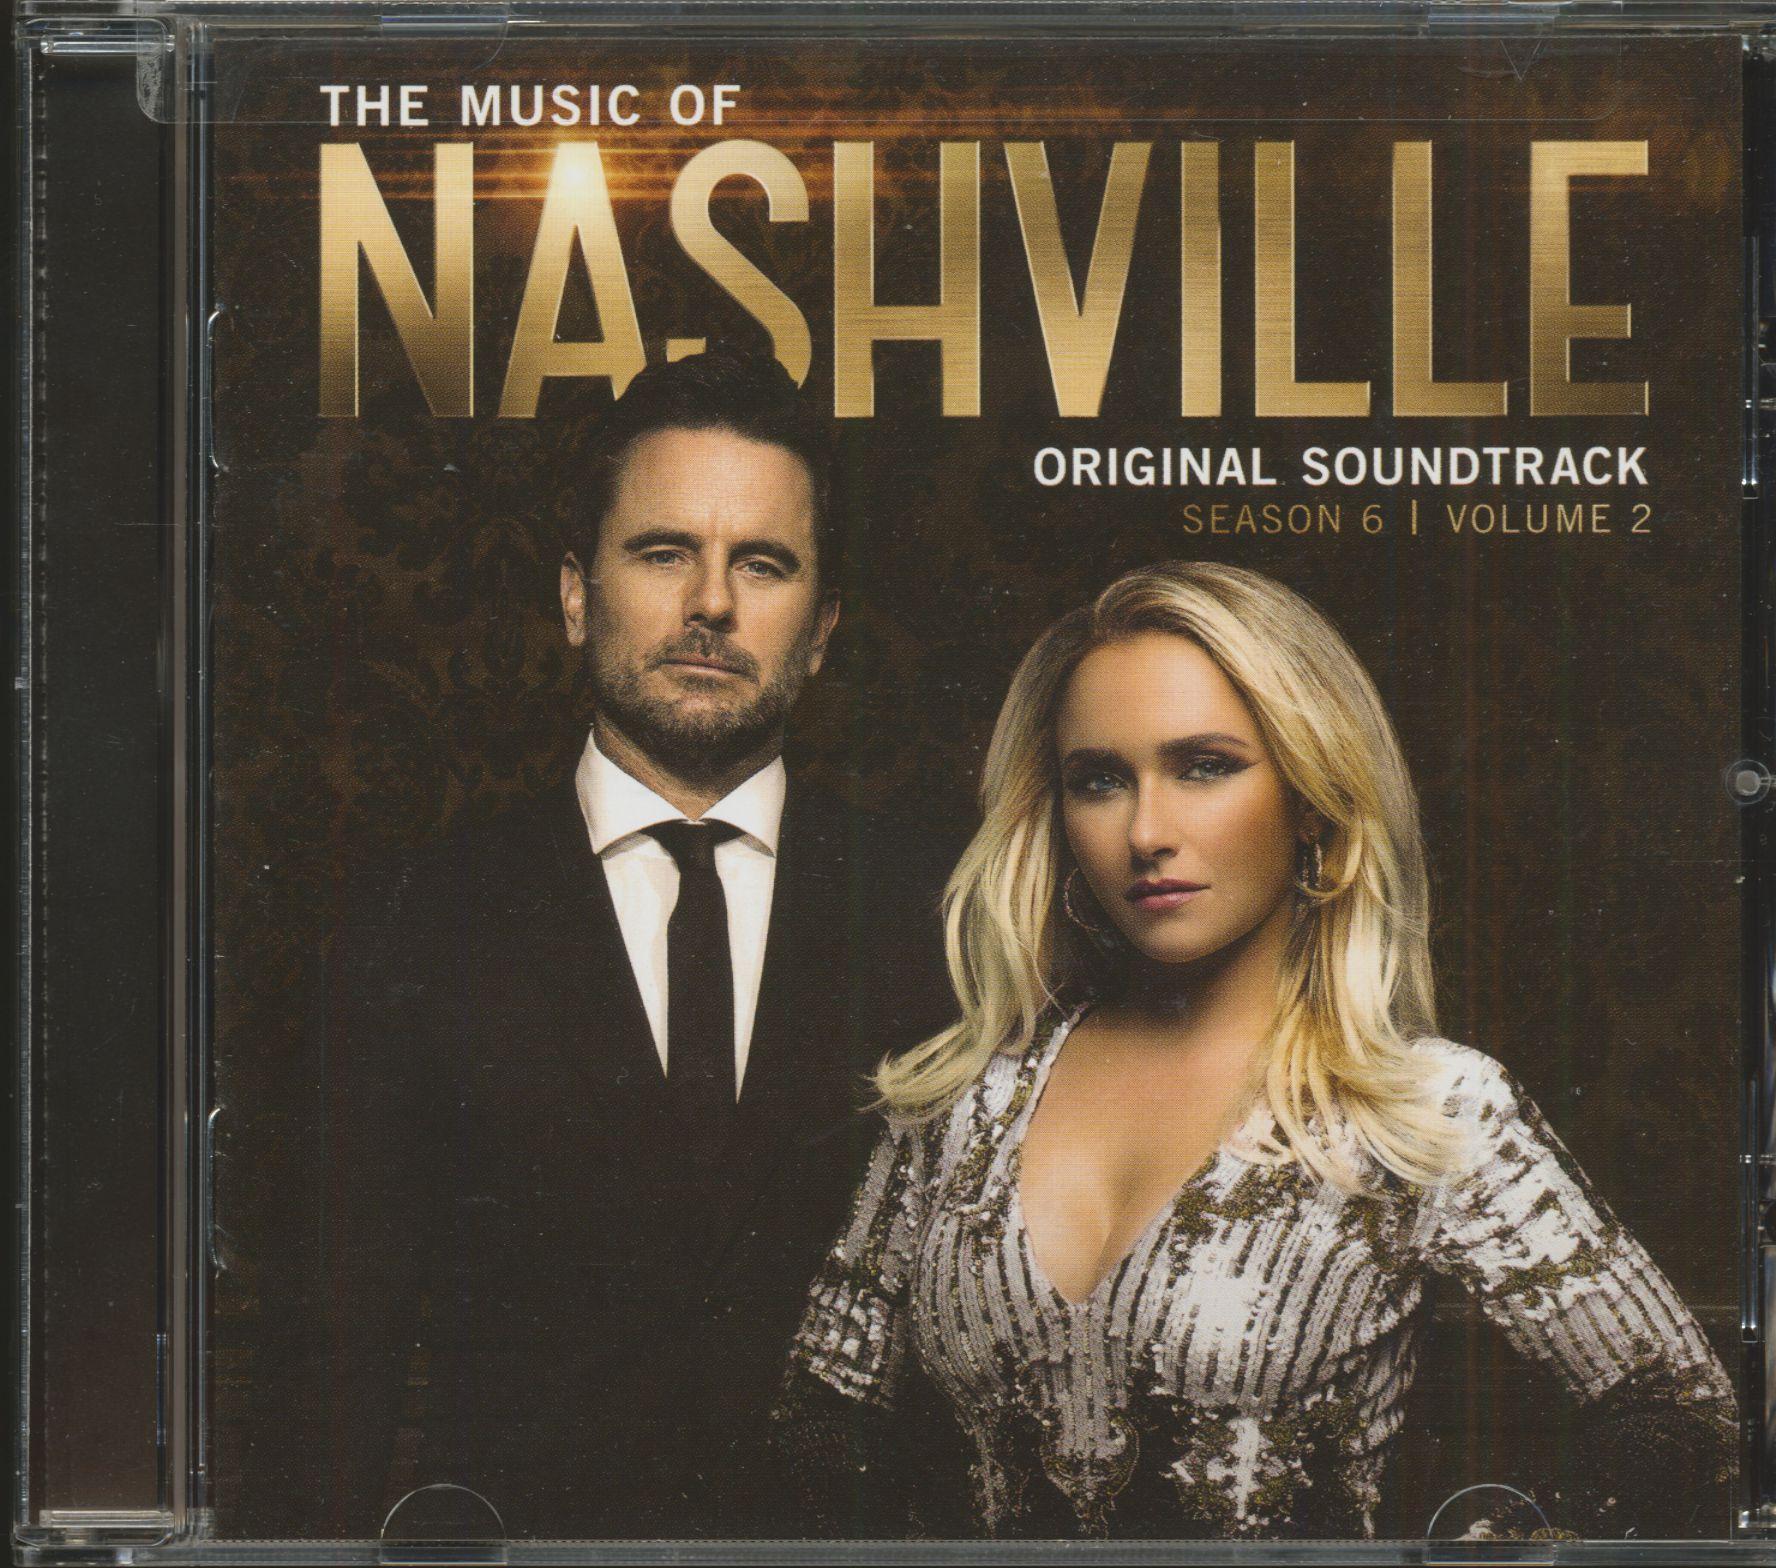 lost highway soundtrack free download